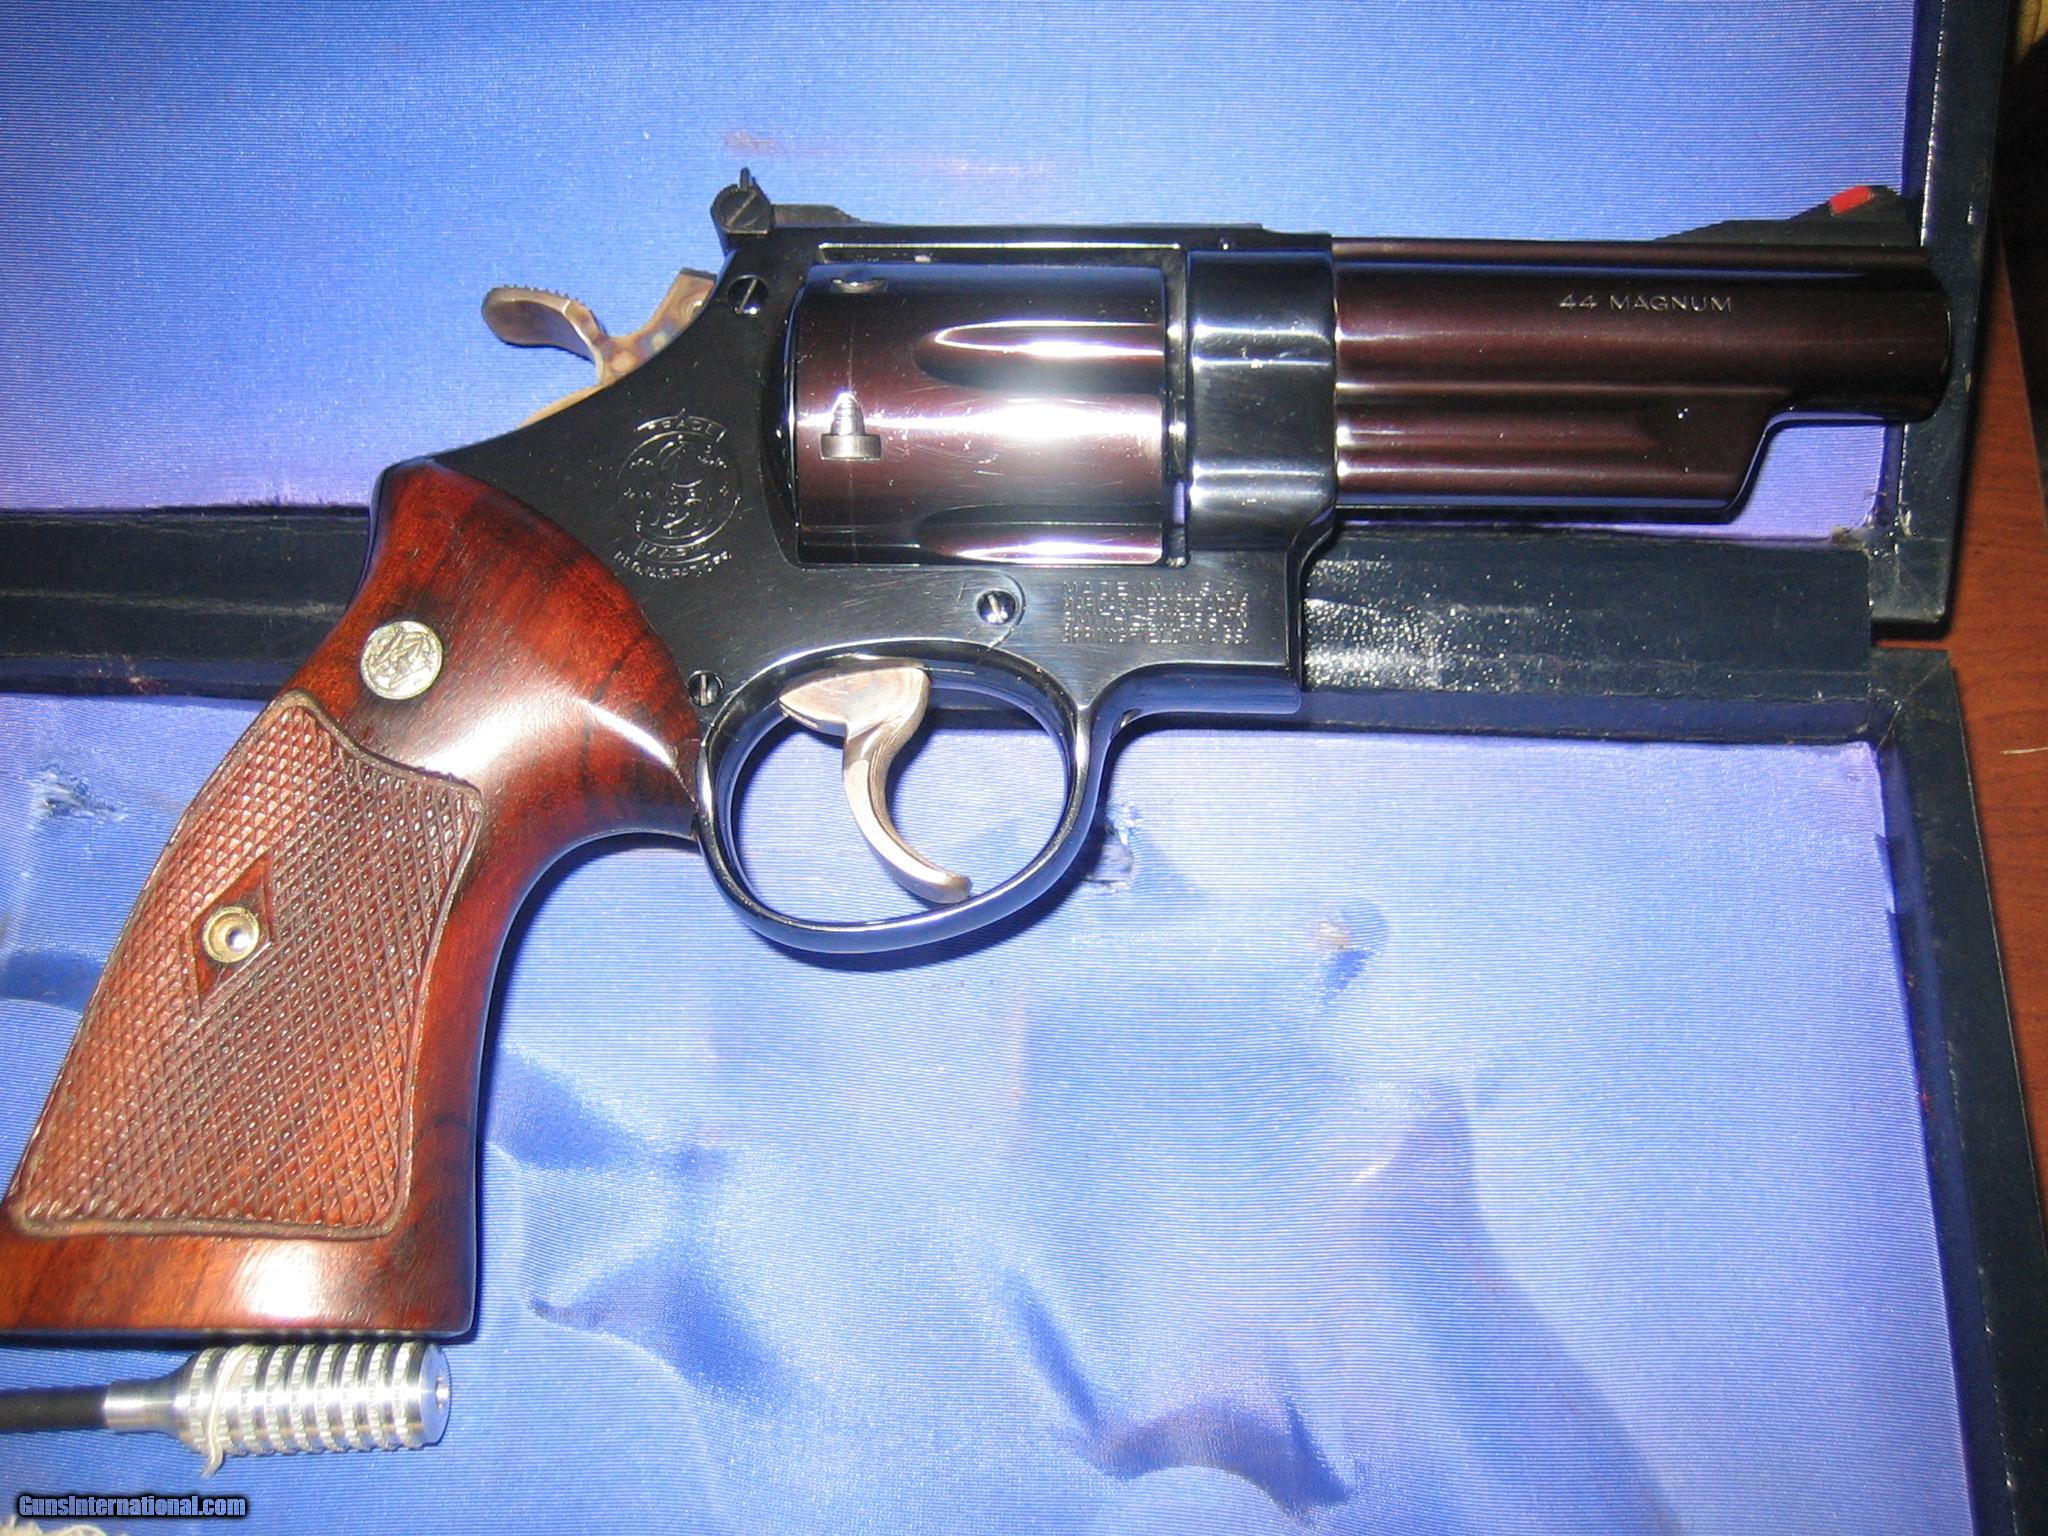 Smith and Wesson PRE Model 29, 44 Magnum Rare 4